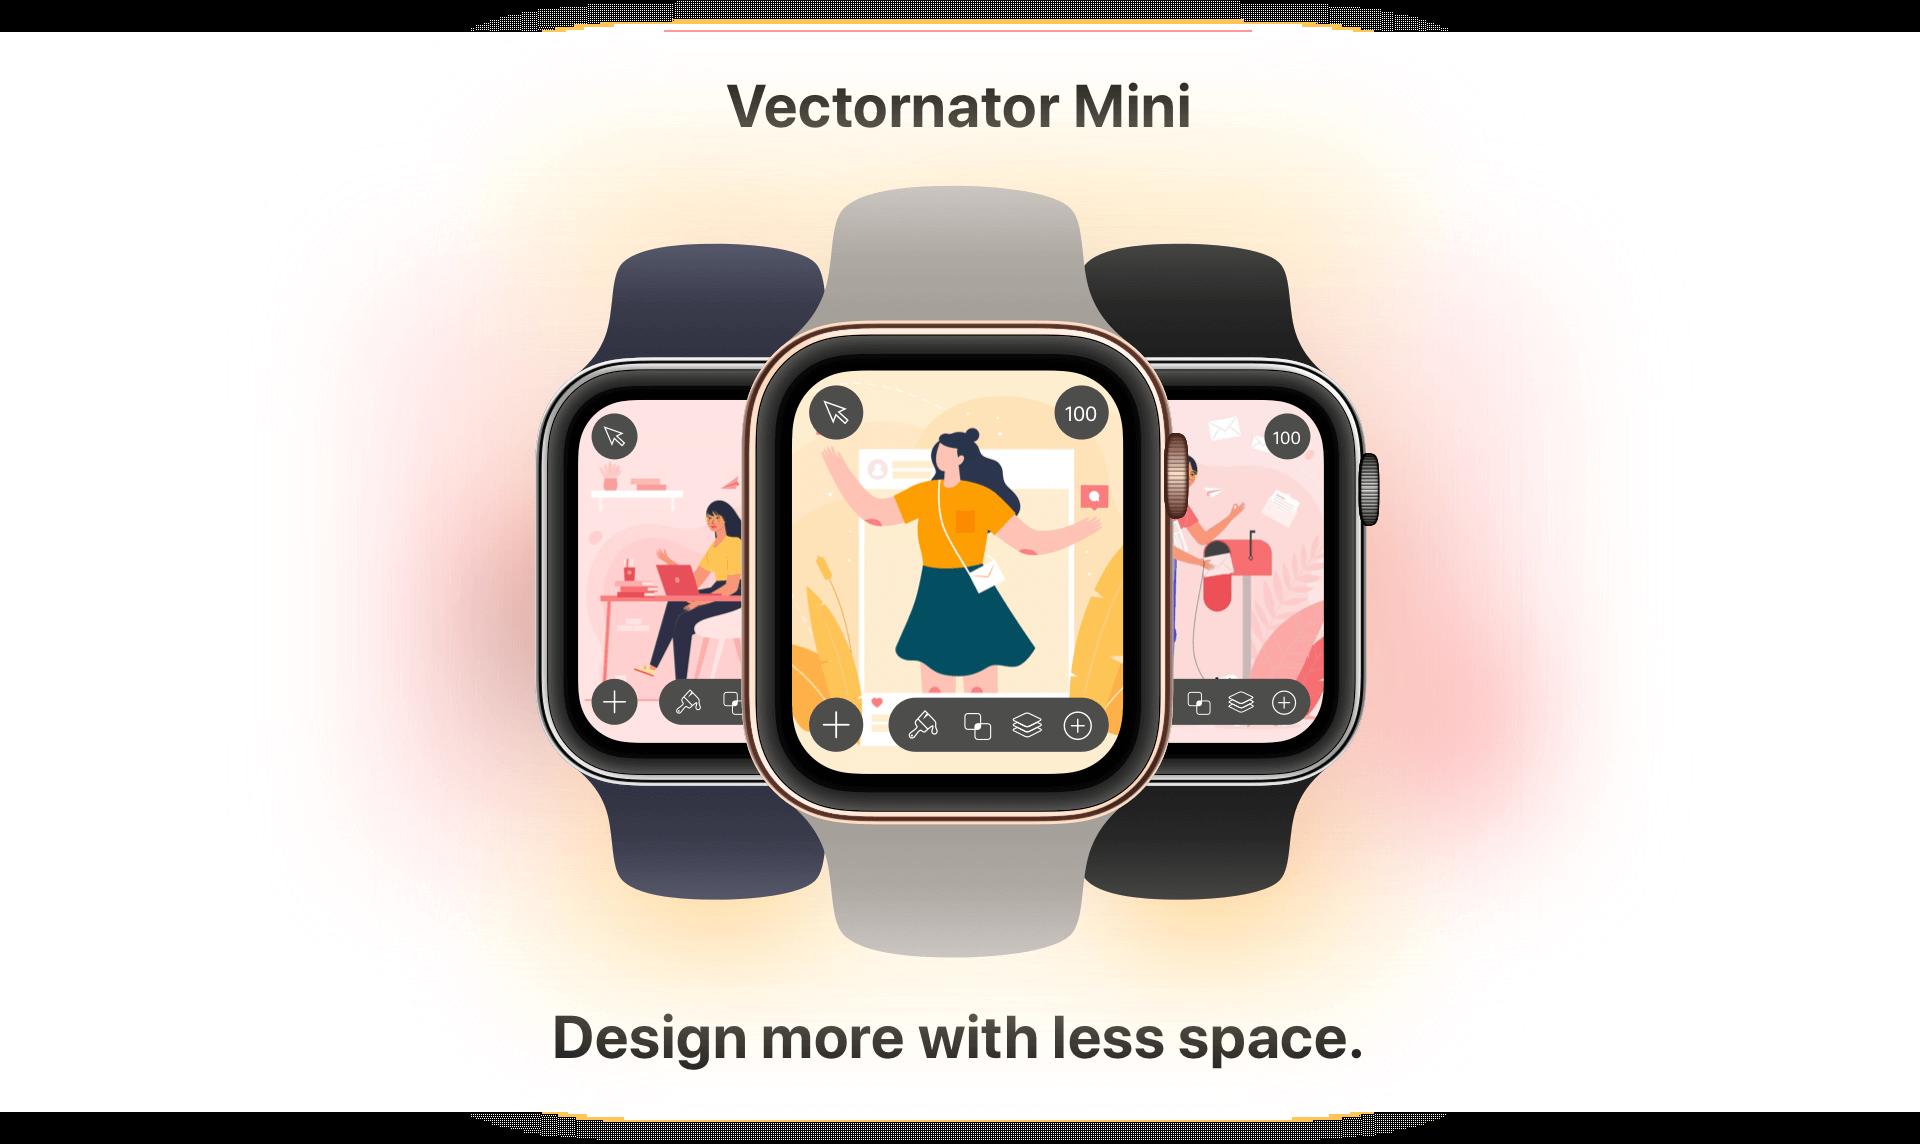 Meet Vectornator Mini: Graphic Design on Apple Watch.